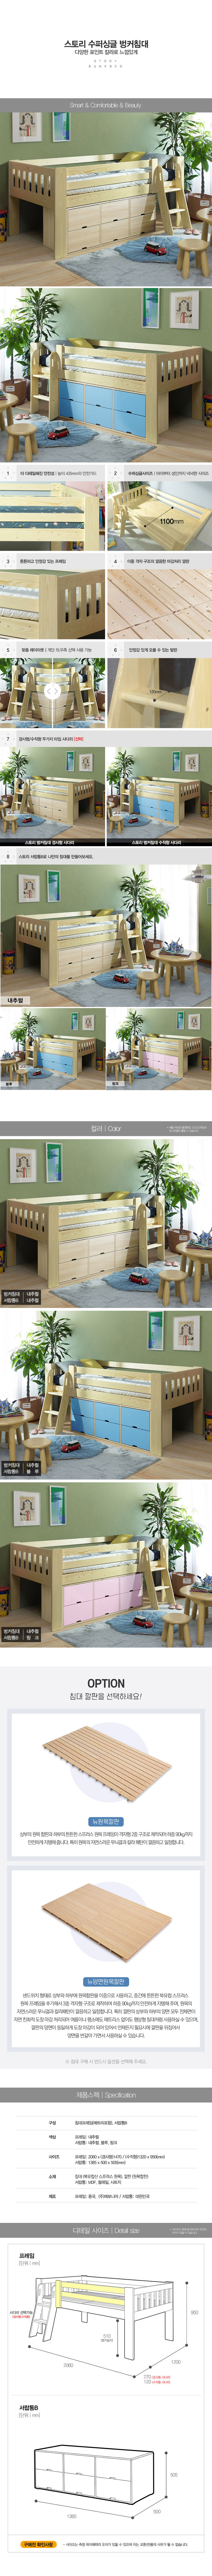 info_storychest4_frame.jpg